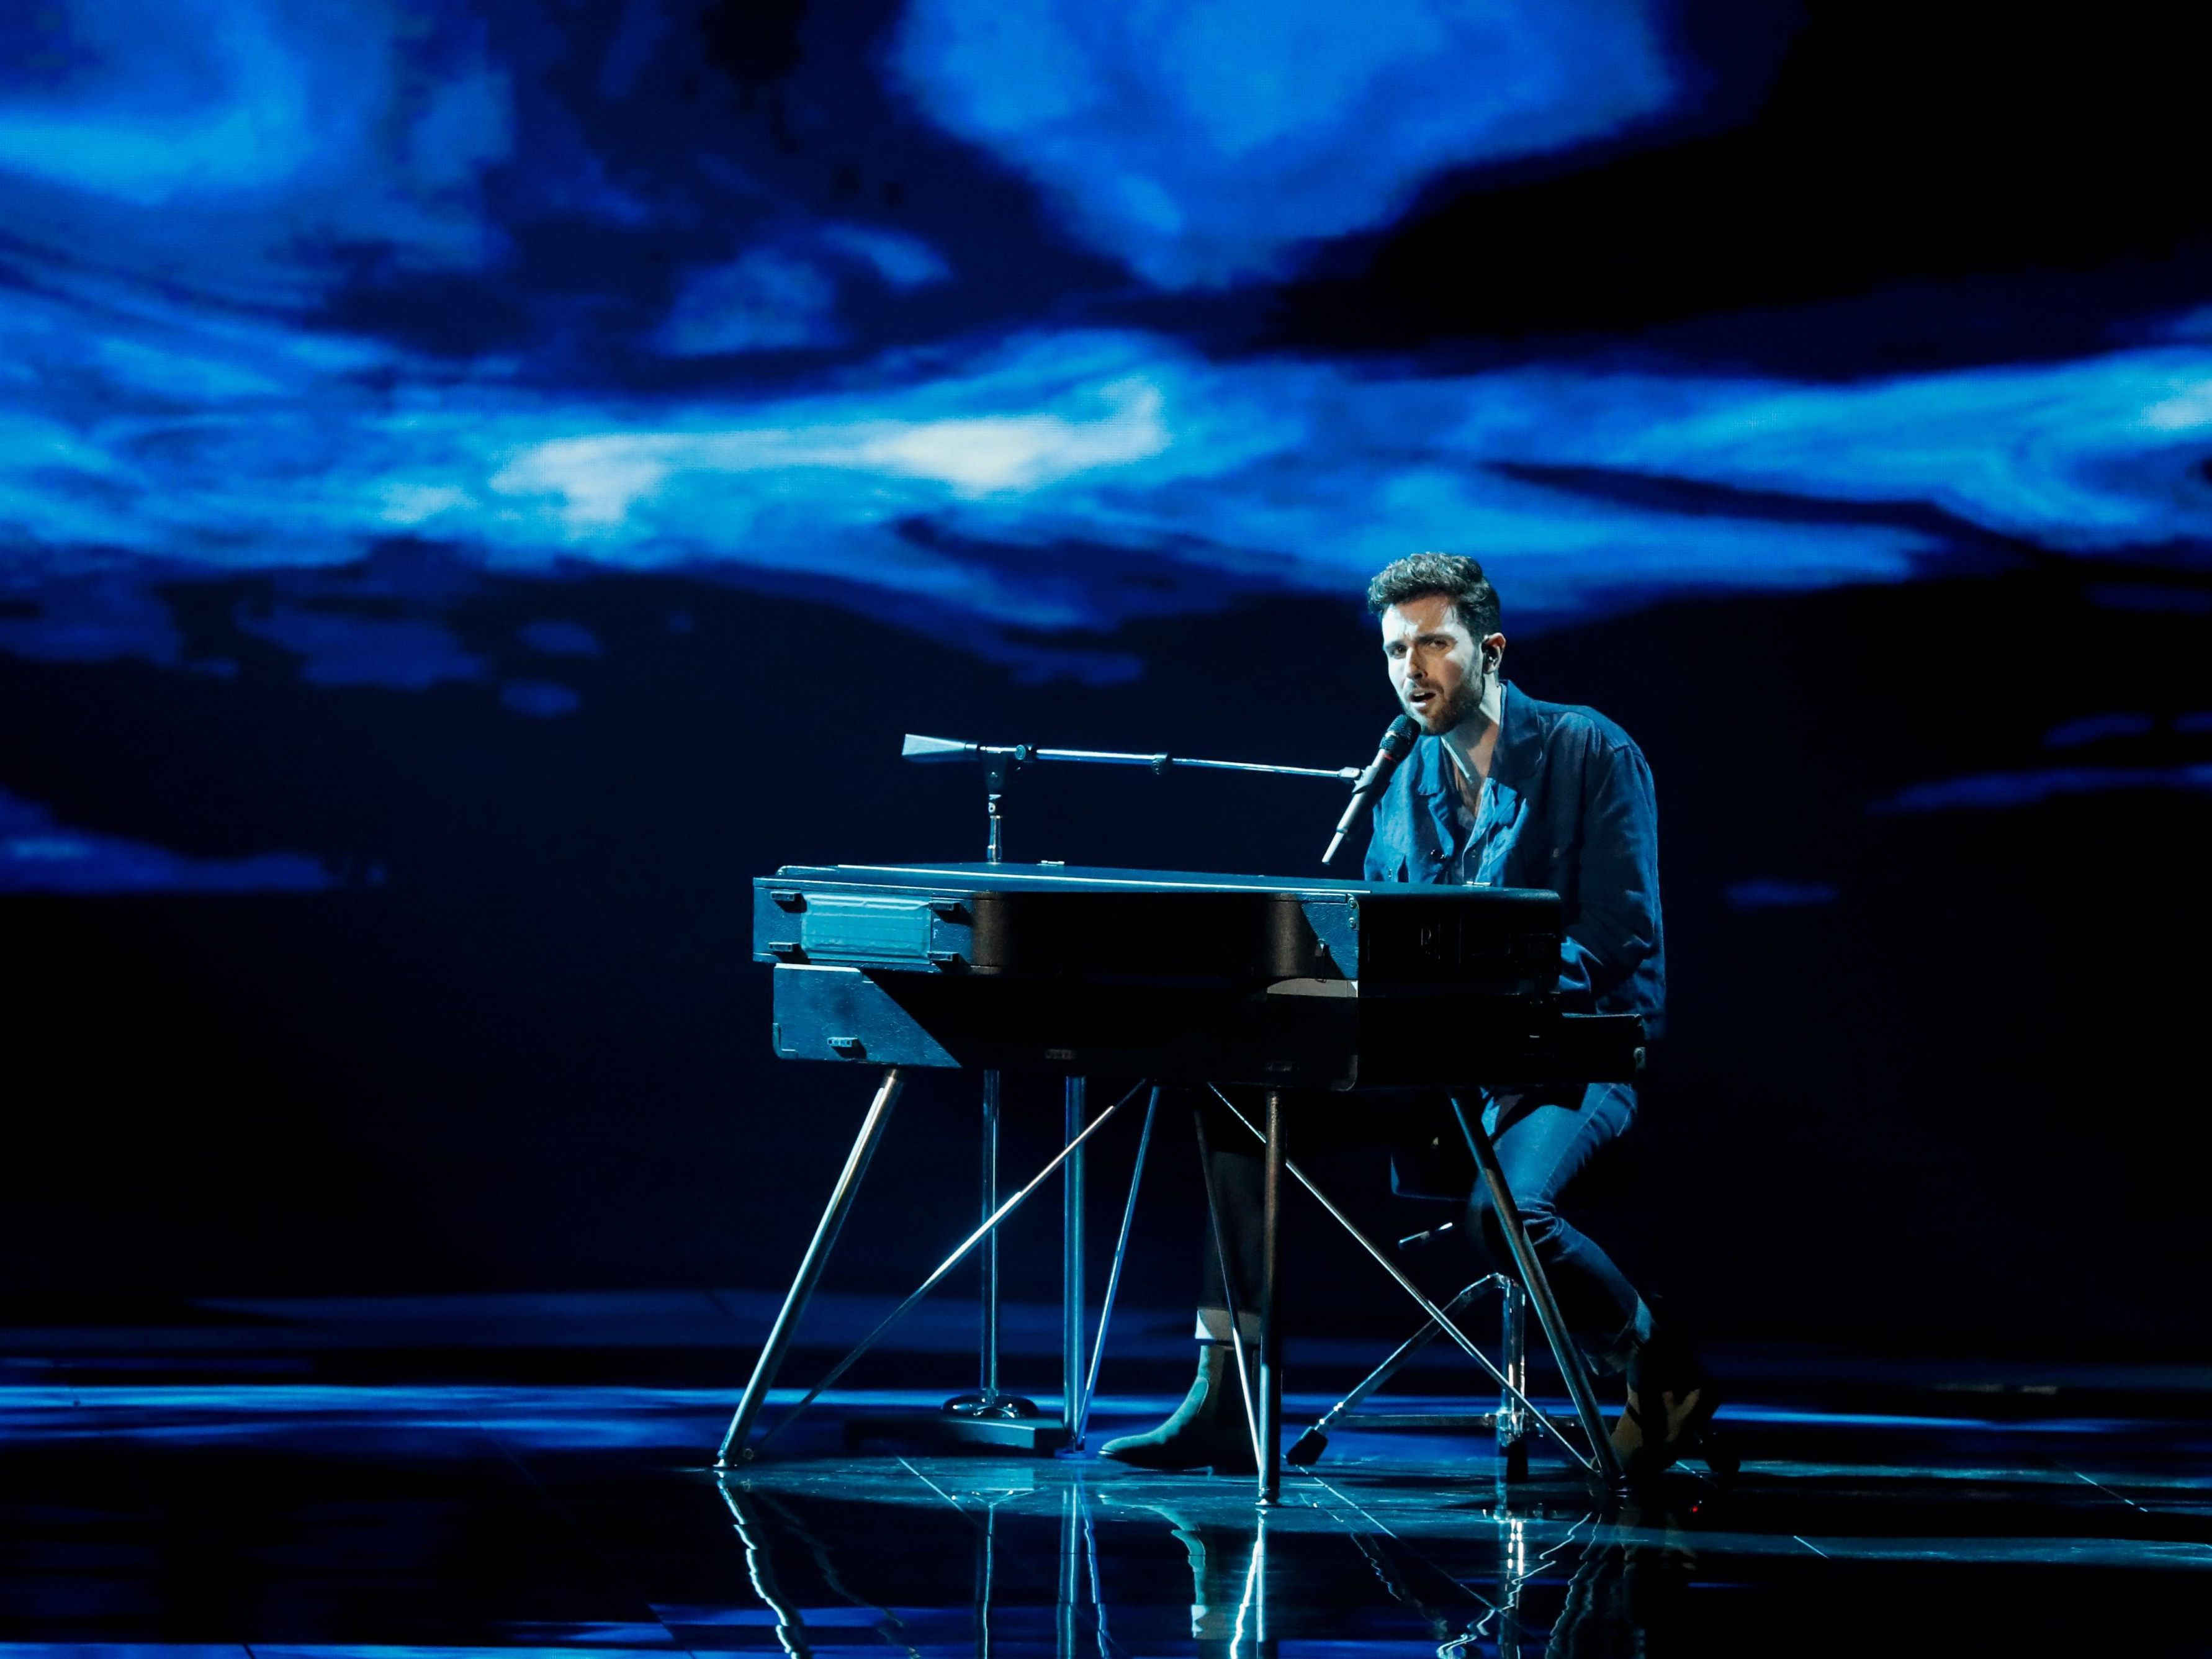 Eurovision Song Contest Niederlande